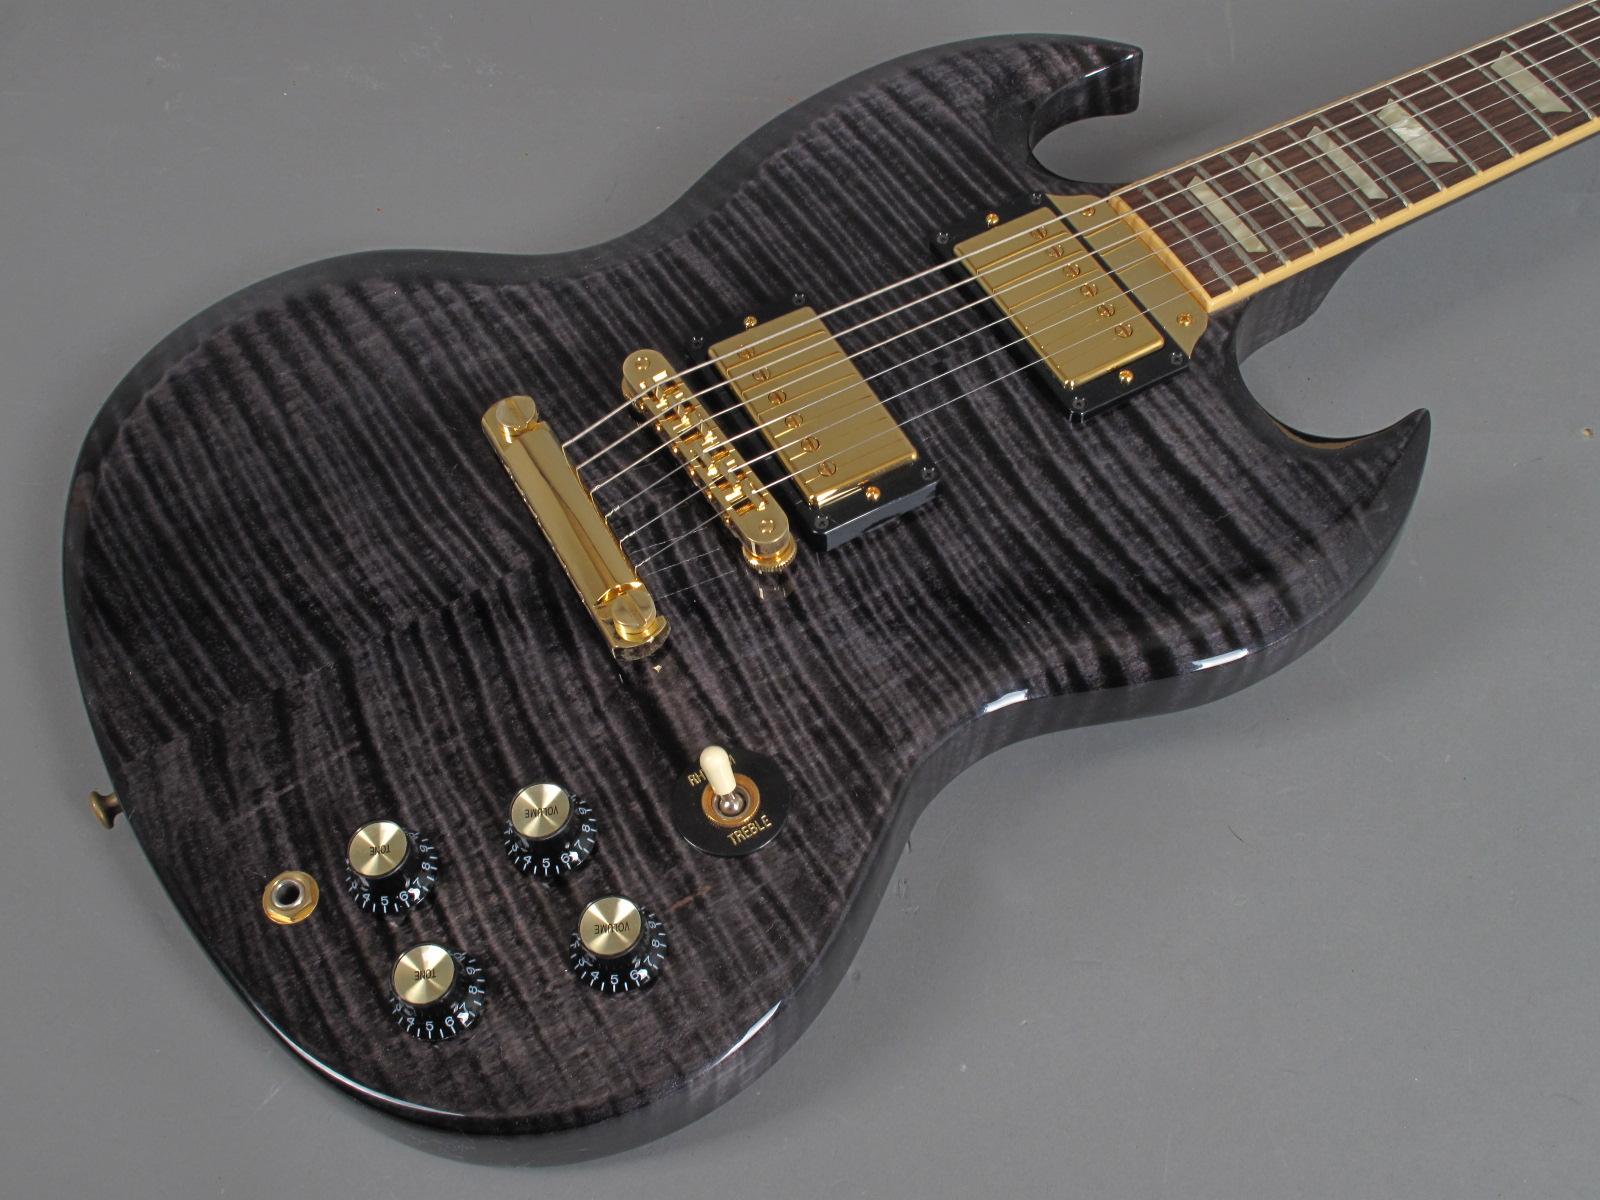 https://guitarpoint.de/app/uploads/products/2007-gibson-sg-select-translucent-black/Gibson-SG-Select-TBK-7.jpg